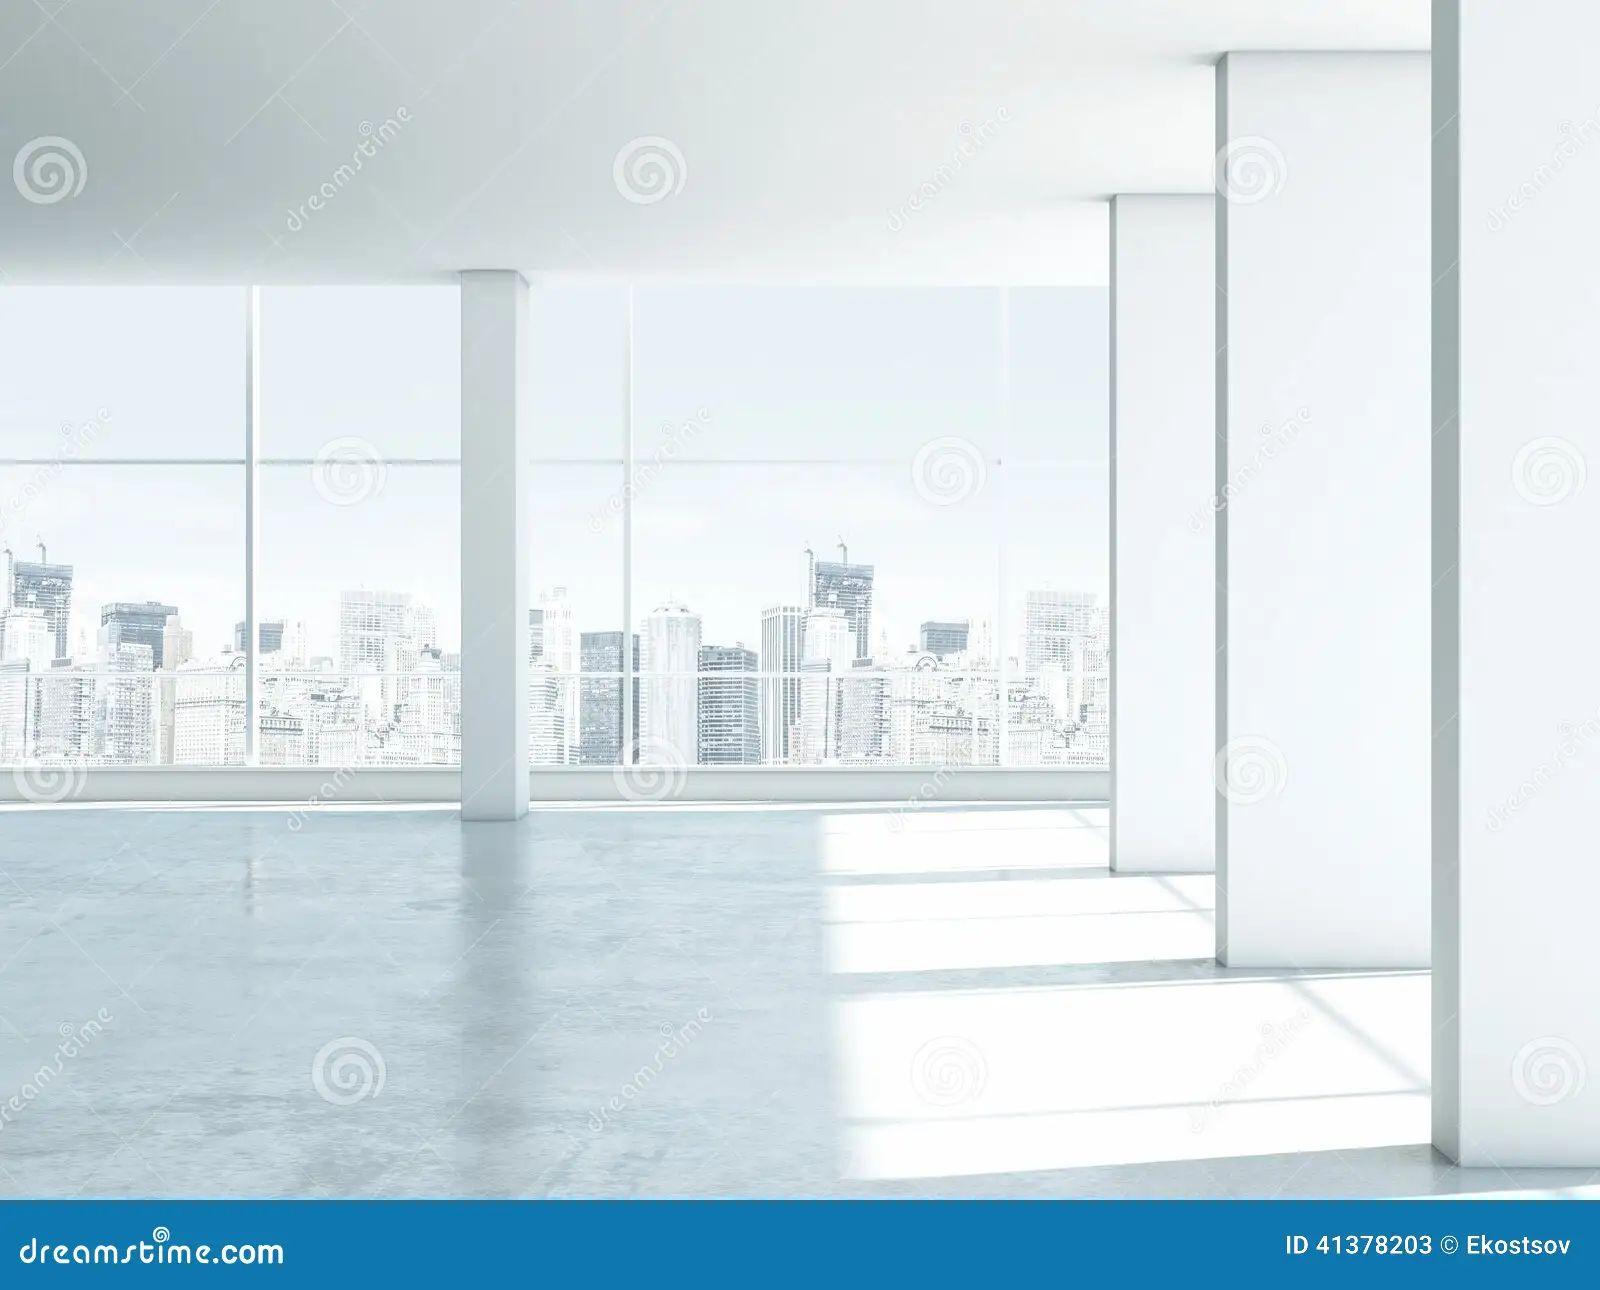 Interior office windows -  Window Empty Interior Office Download